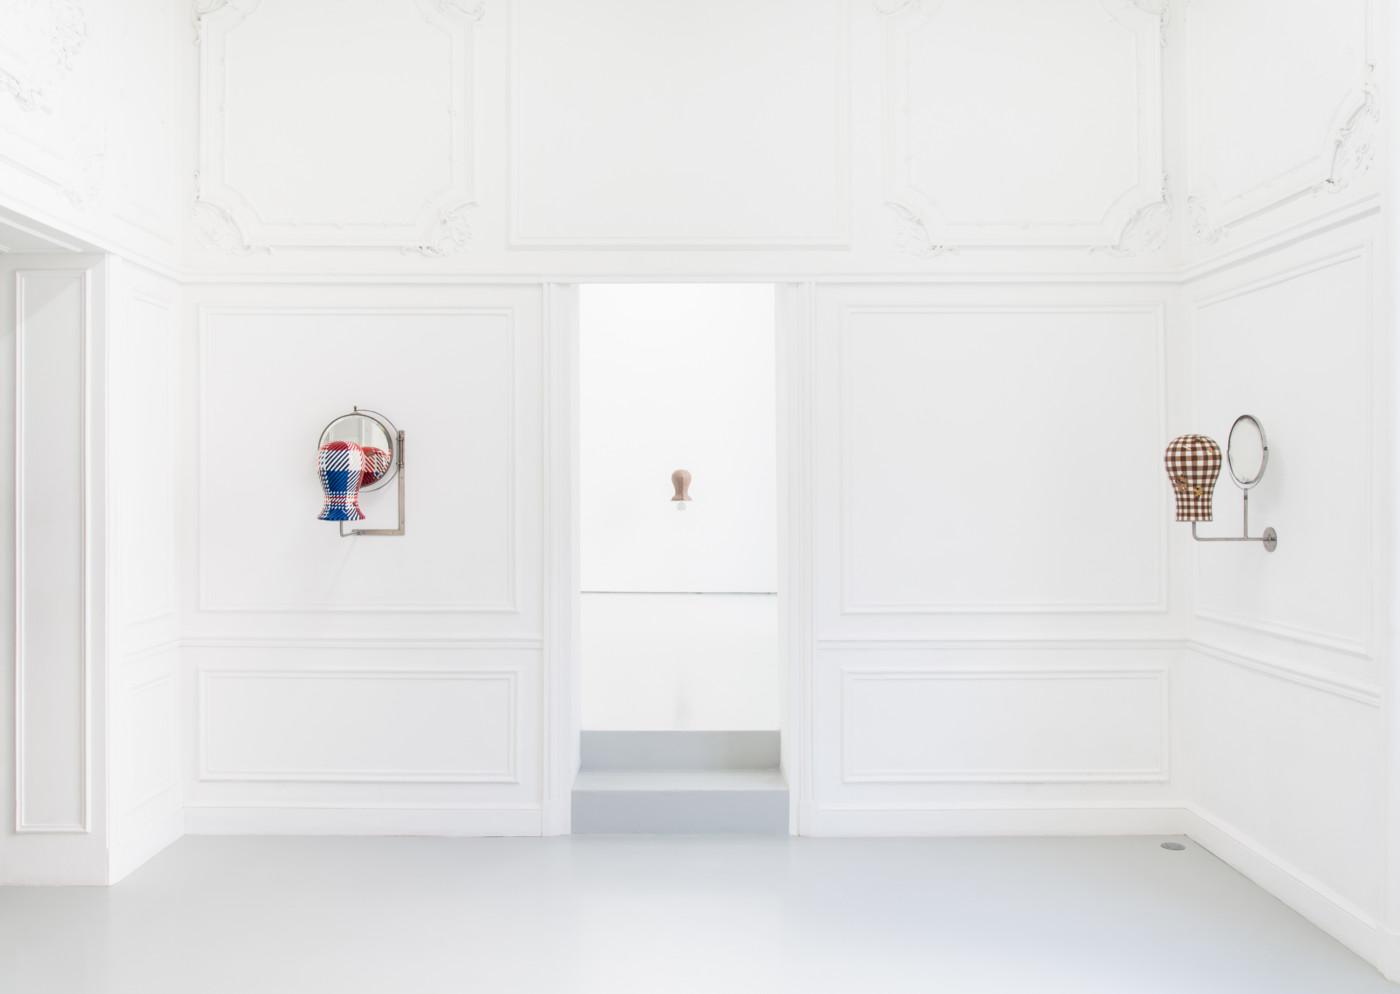 ORION MARTIN  Tête , 2019, High Art, Paris, installation view - High Art Gallery Paris